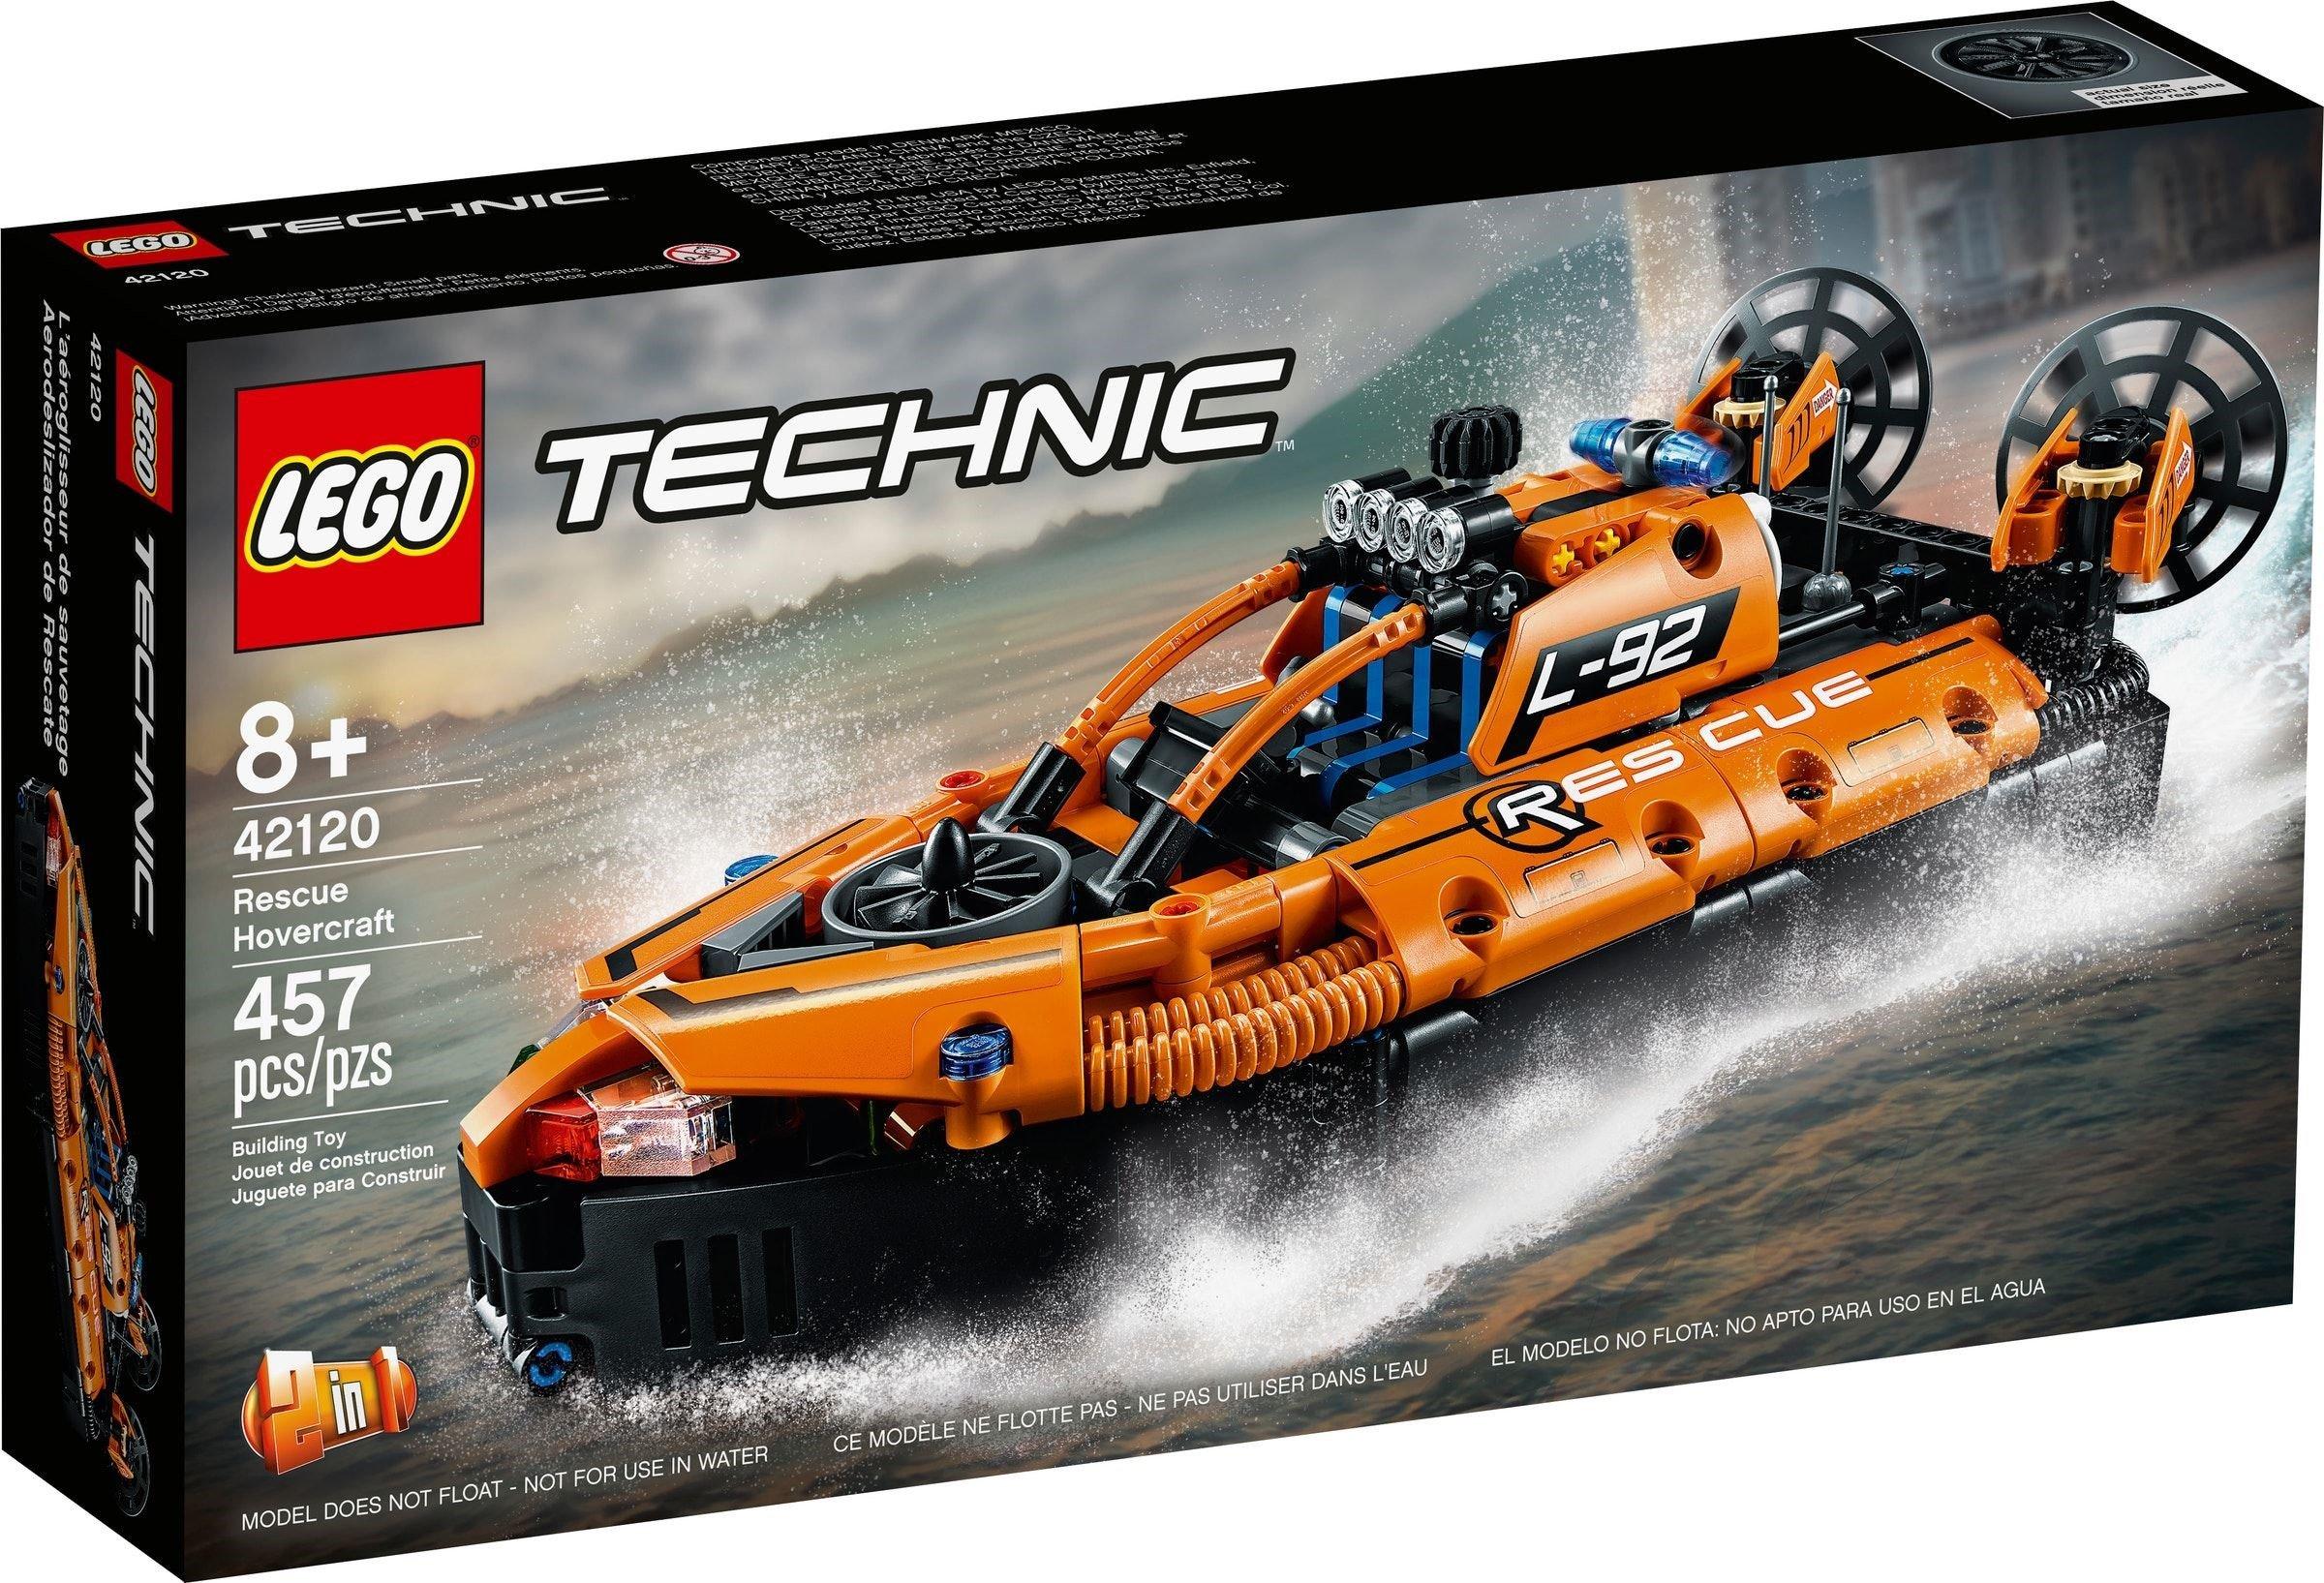 LEGO Technic - Rescue Hovercraft (42120)